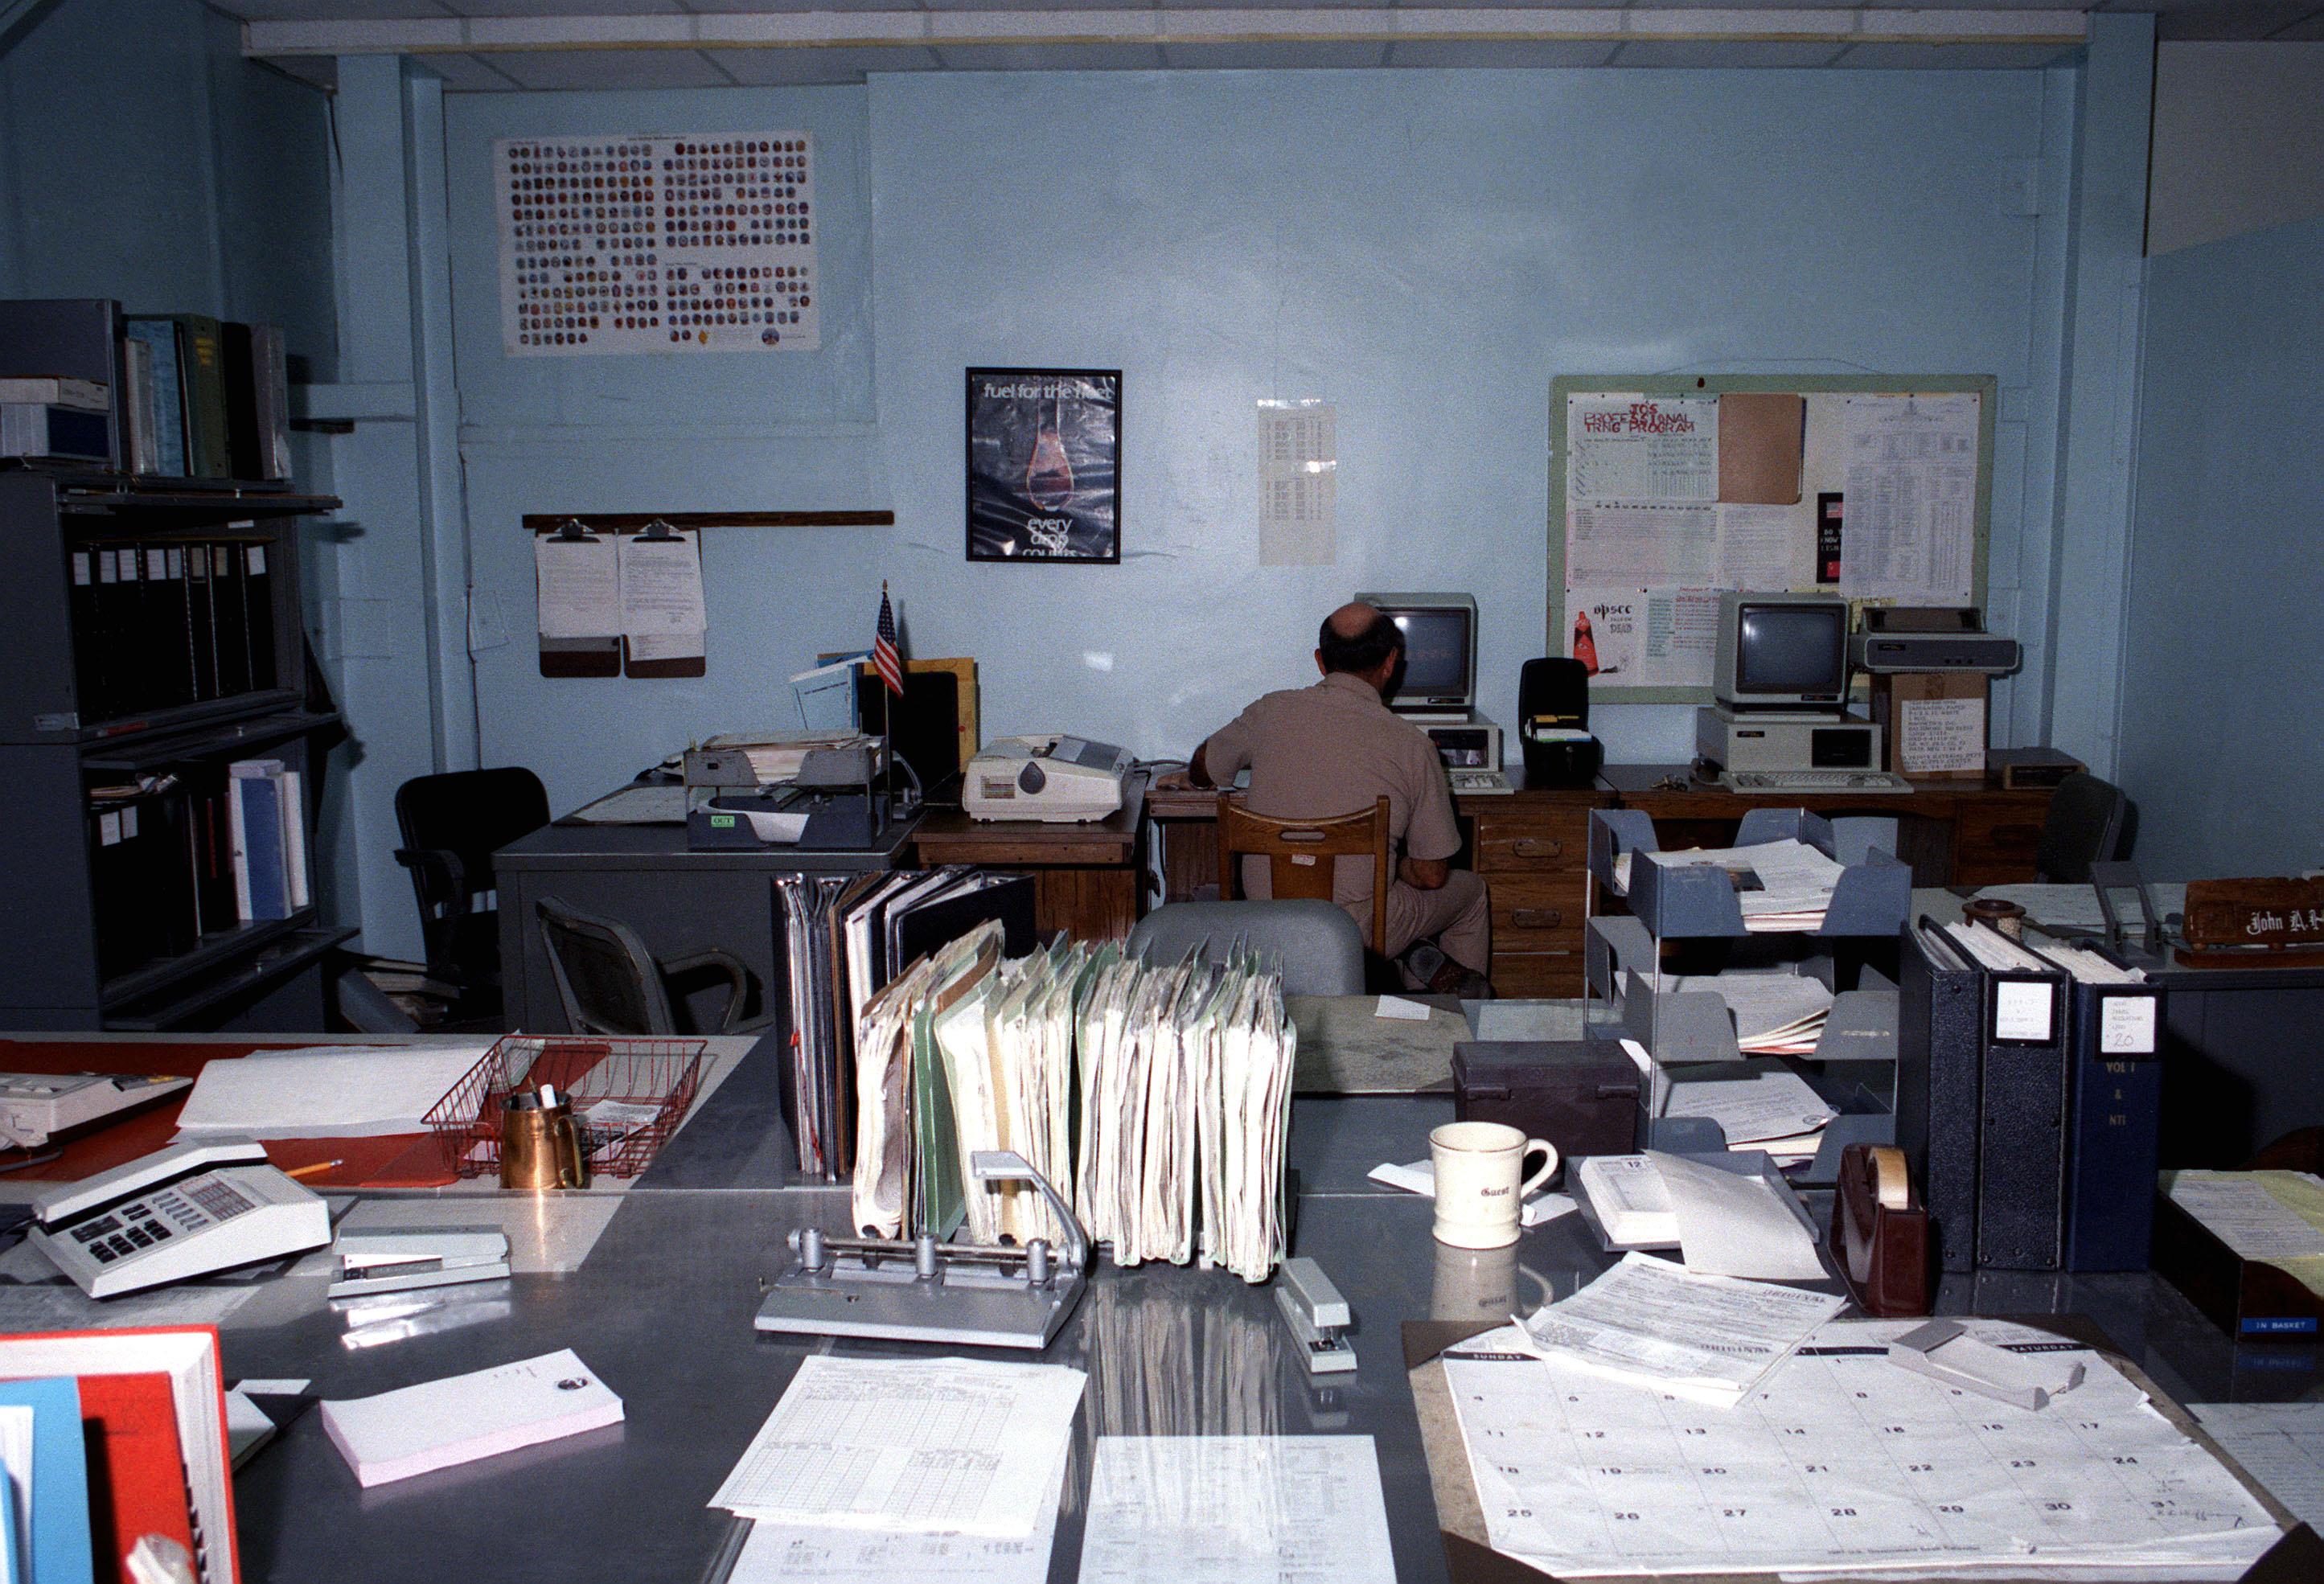 SENIOR CHIEF Aviation Anti-submarine Warfare Technician Elkins uses a computer in the Patrol Squadron 10 (VP-10) material control office